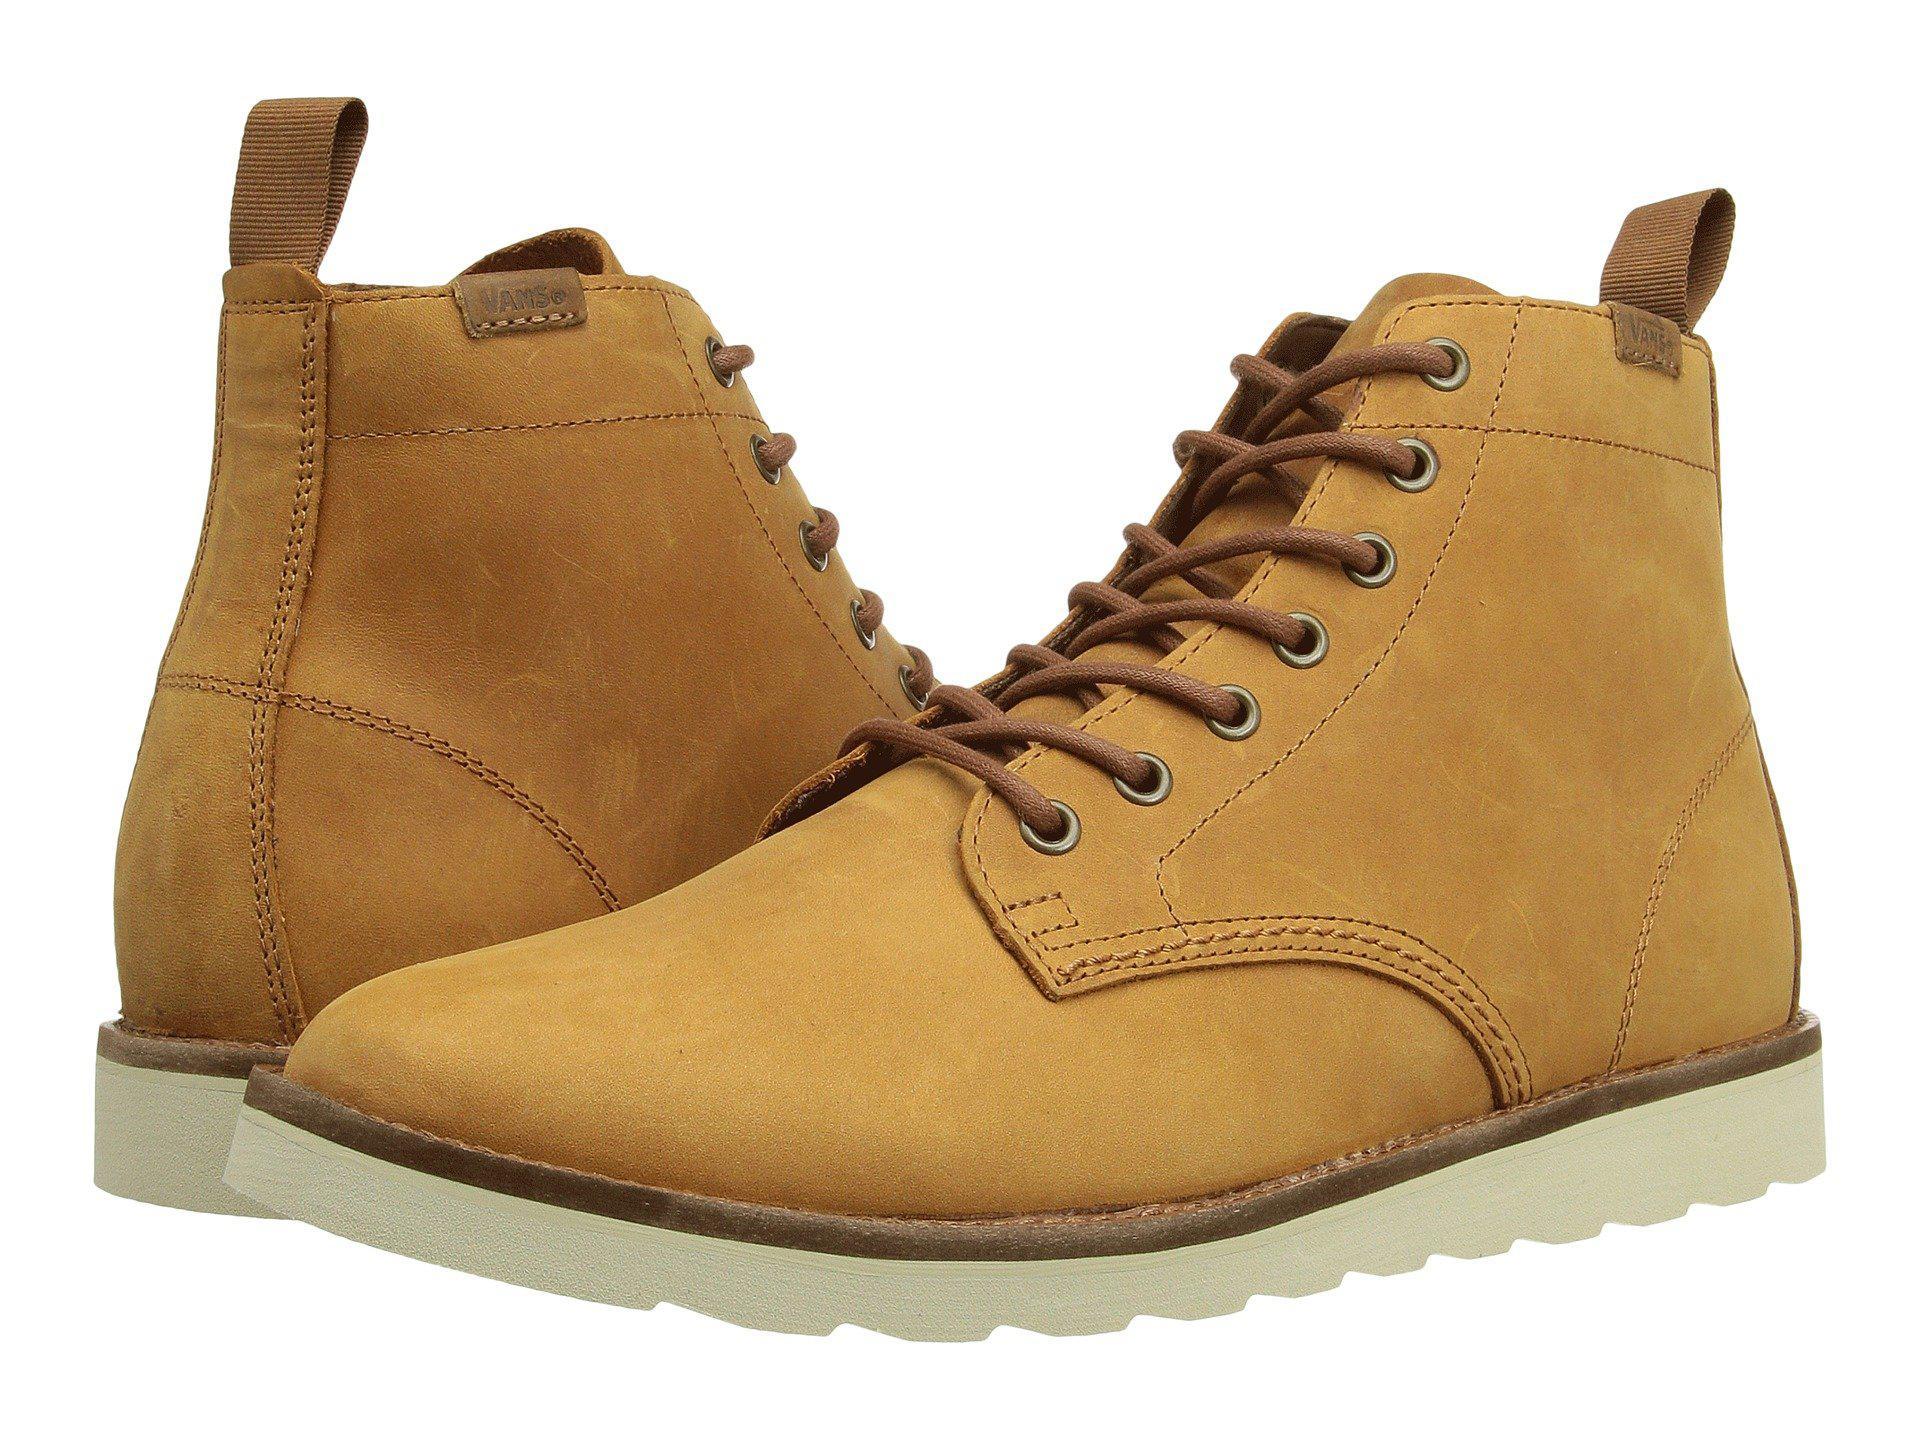 574a907399 Lyst - Vans Sahara Boot in Brown for Men